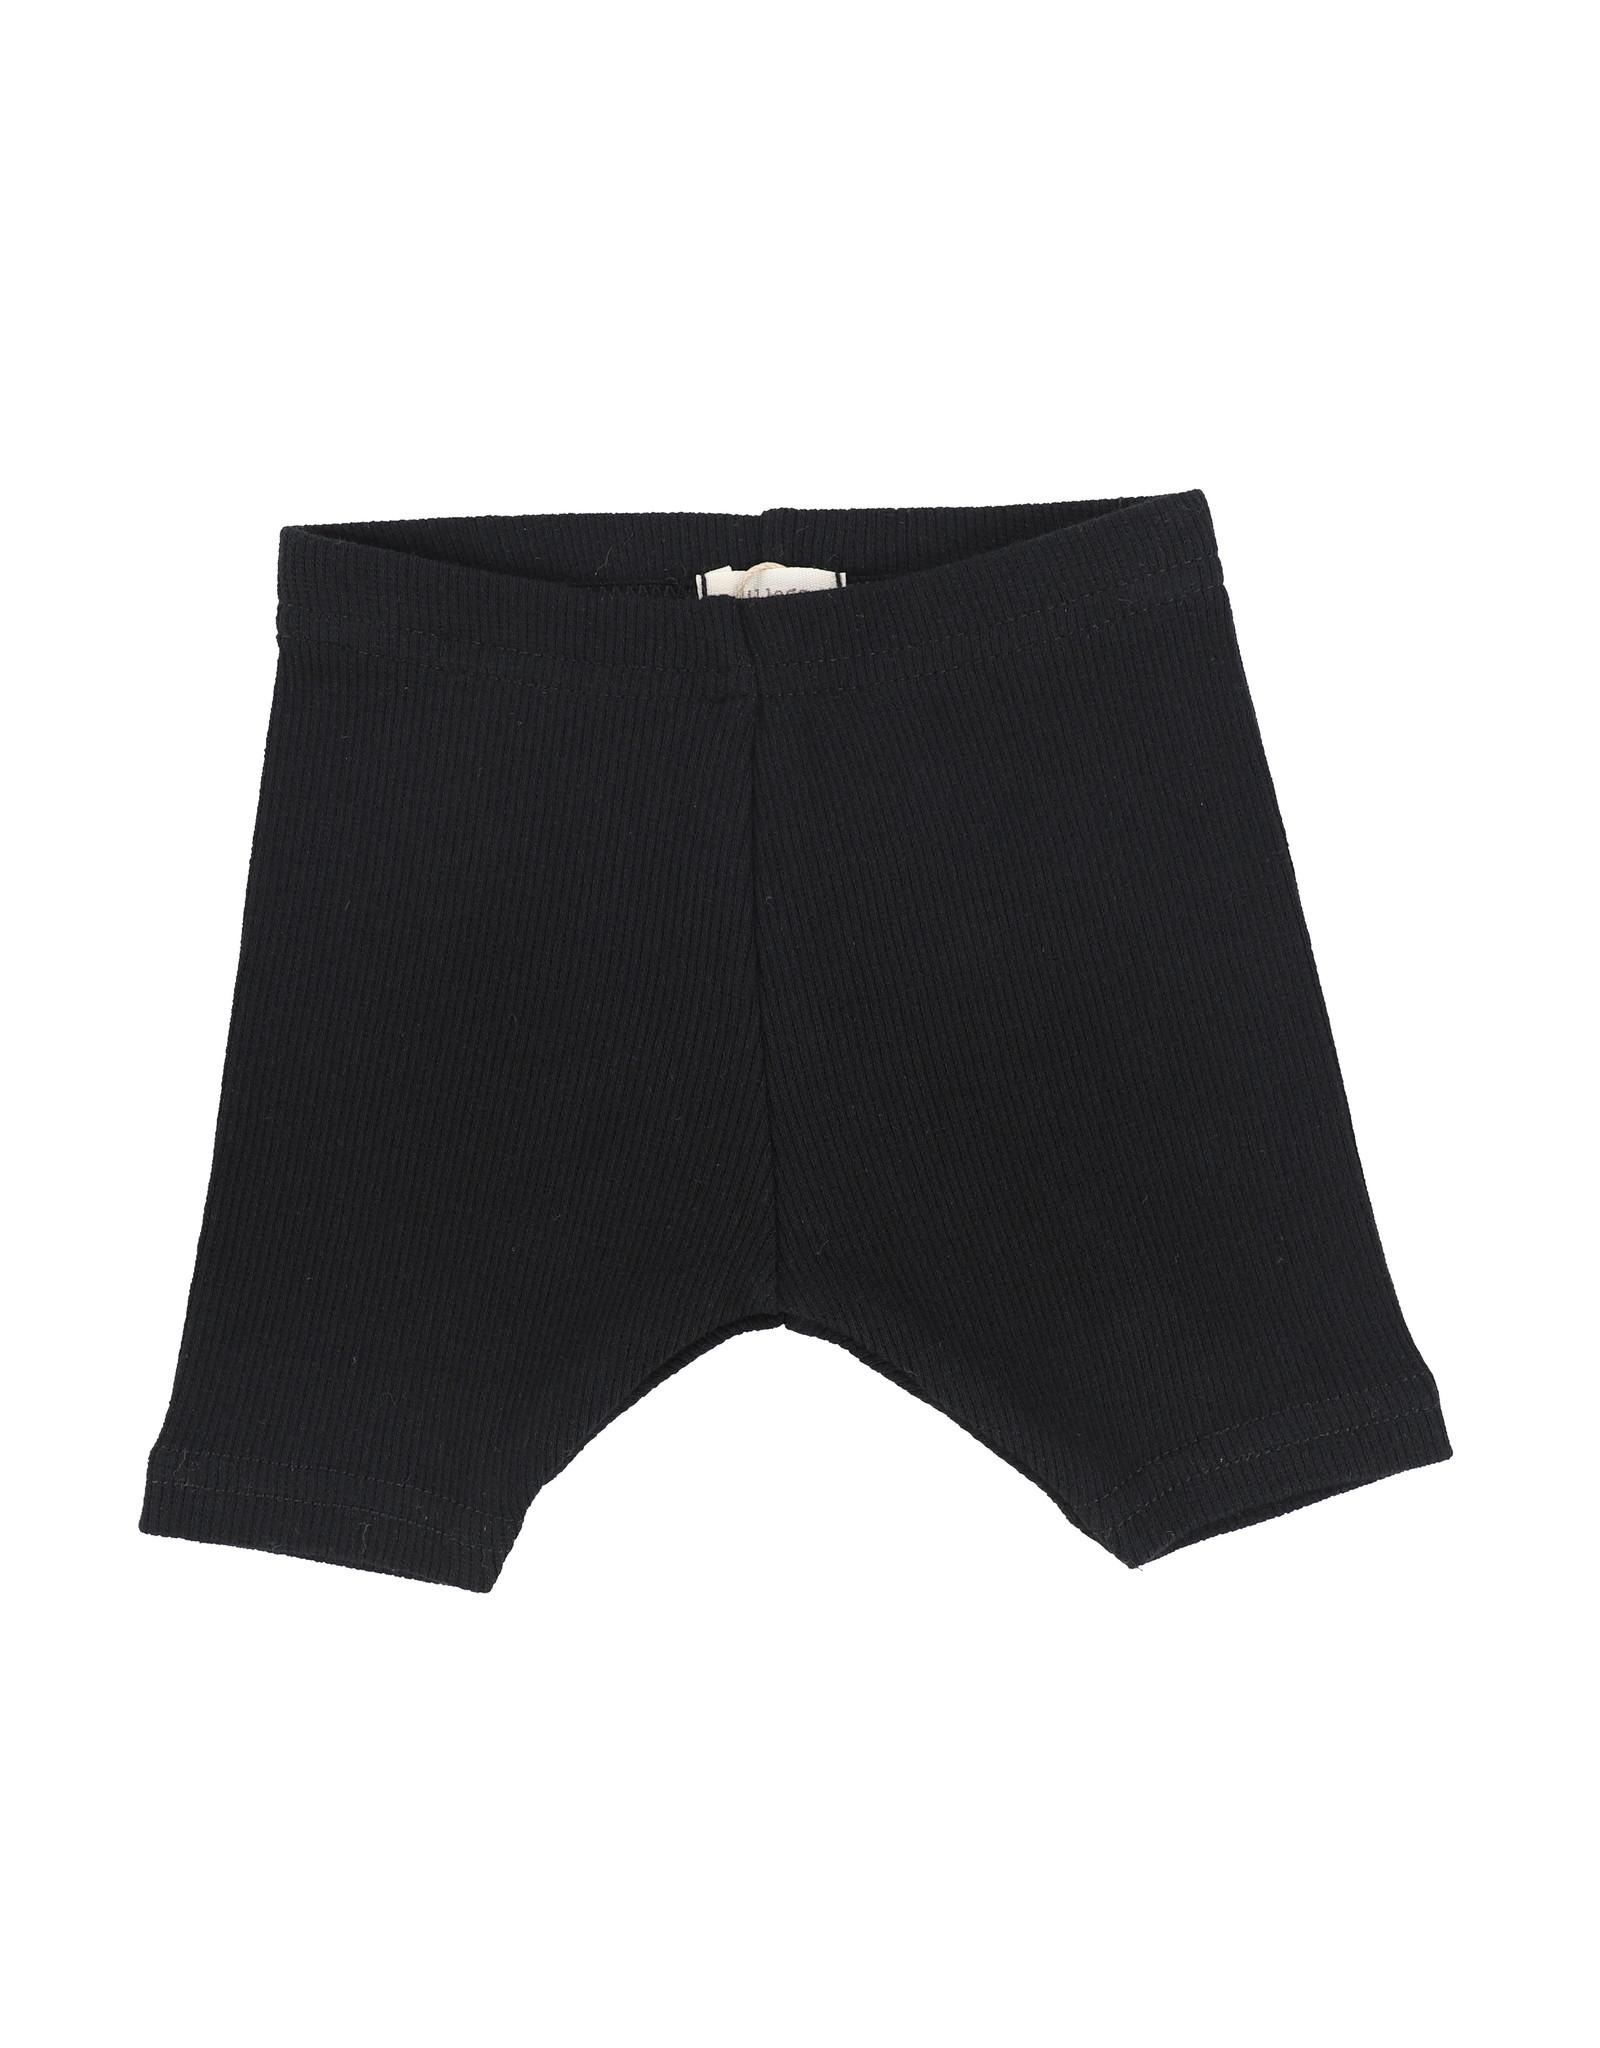 LIL LEGS Lil Legs Rib Shorts Basic Colors